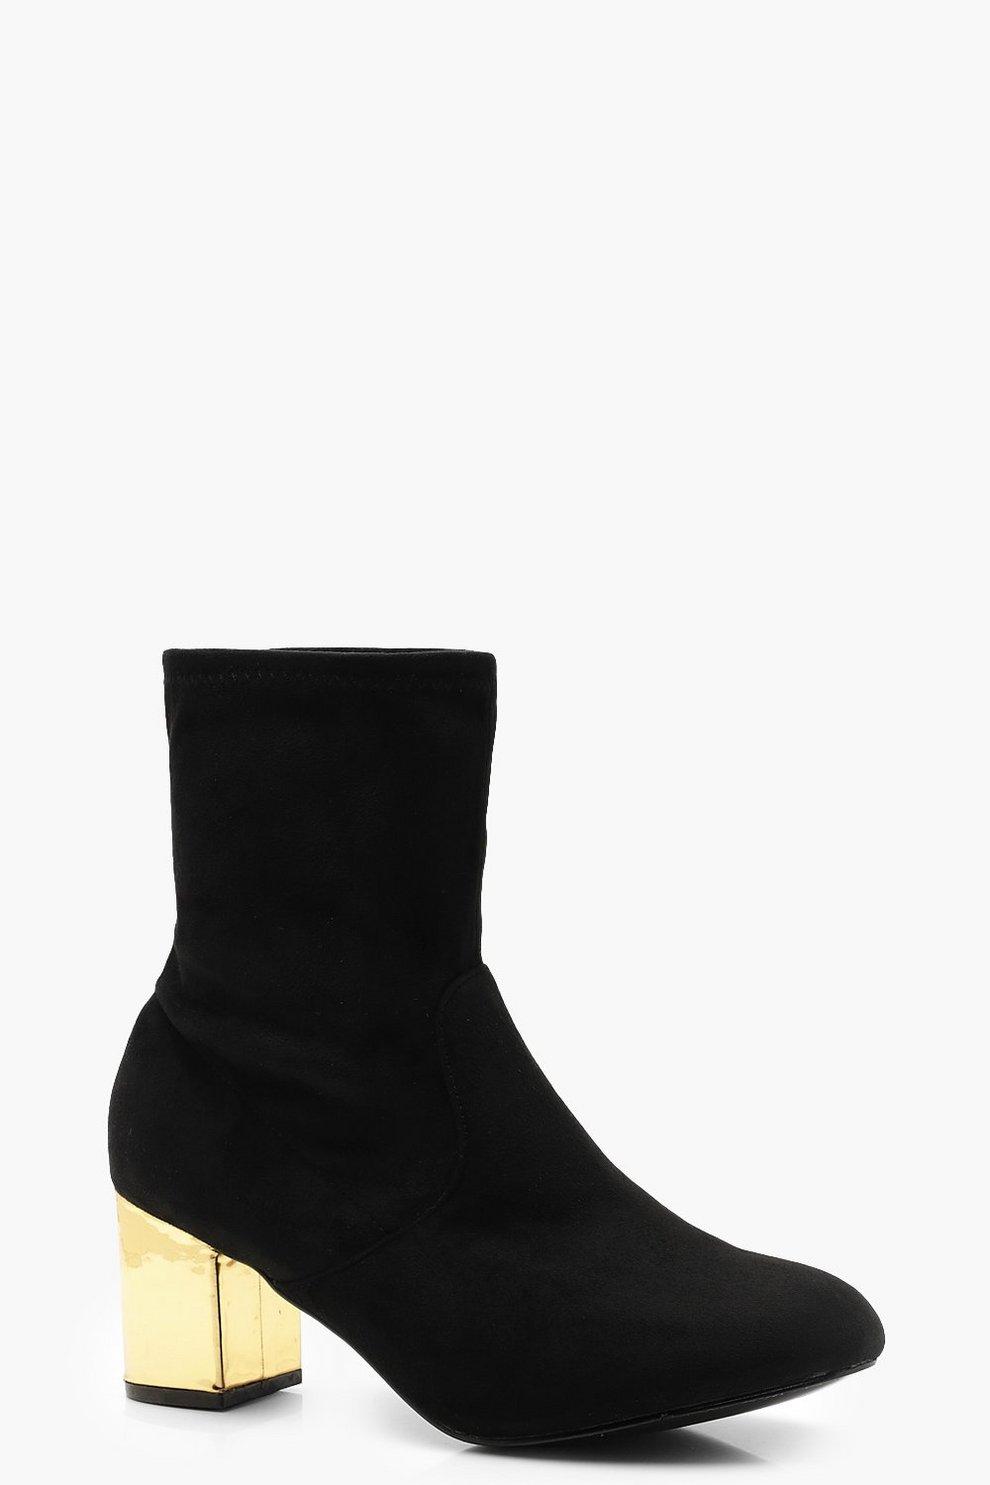 714e9081b5e4 Wide Fit Contrast Heel Sock Boots